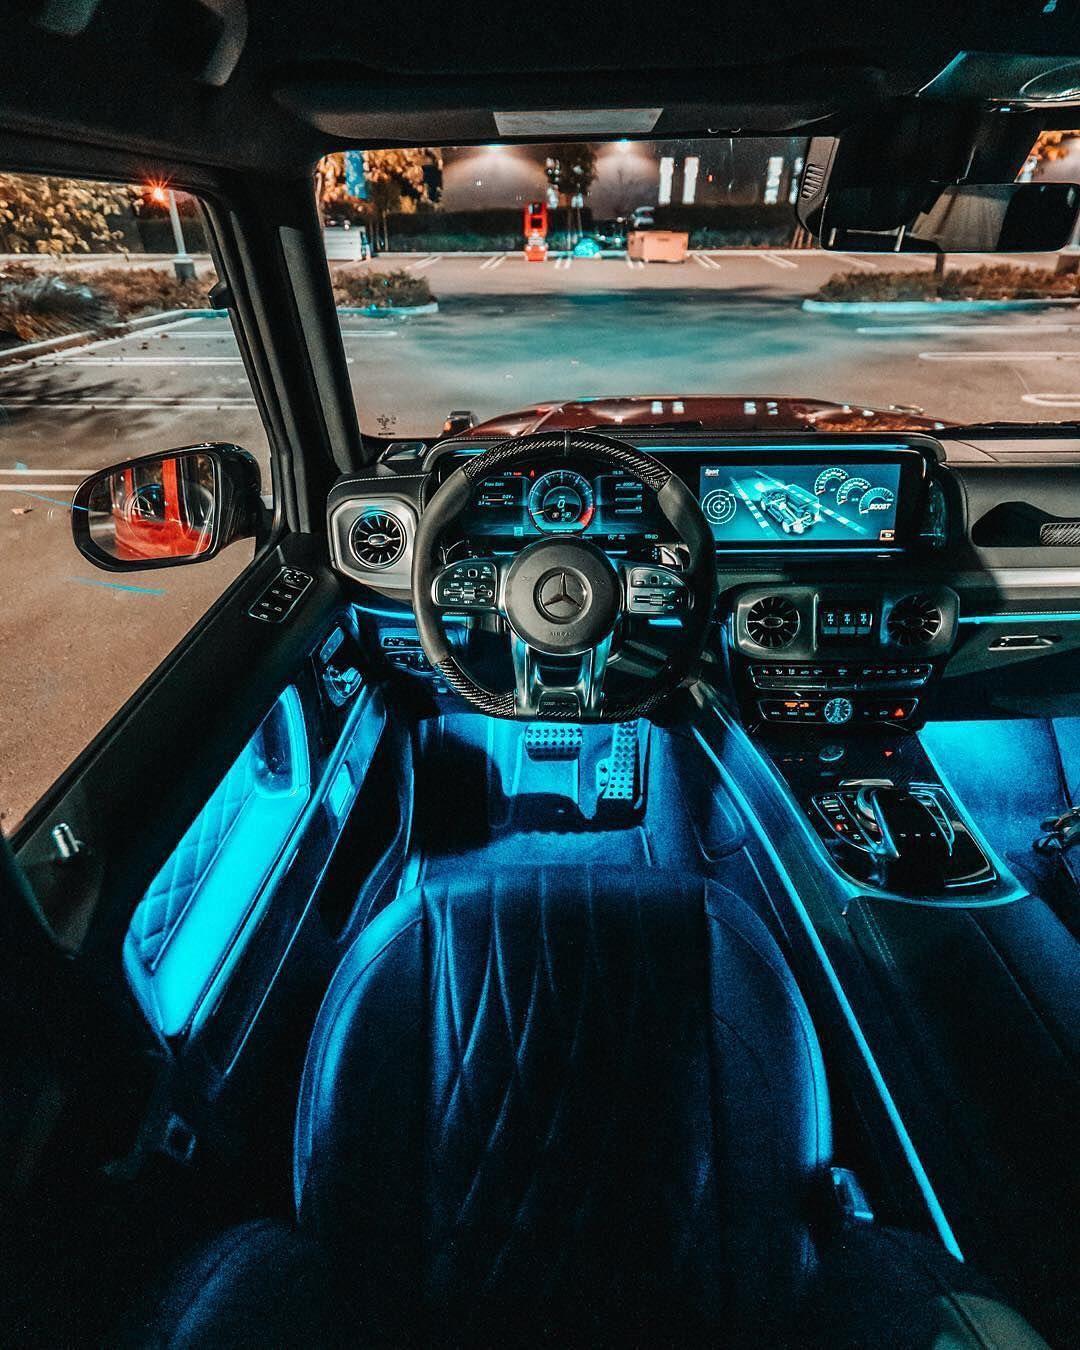 Millionaire Lifestyle On Instagram Name The Model Photo By Lazton Millionairelifestyle Mercedes C Audi Cars Luxury Car Interior Mercedes Interior